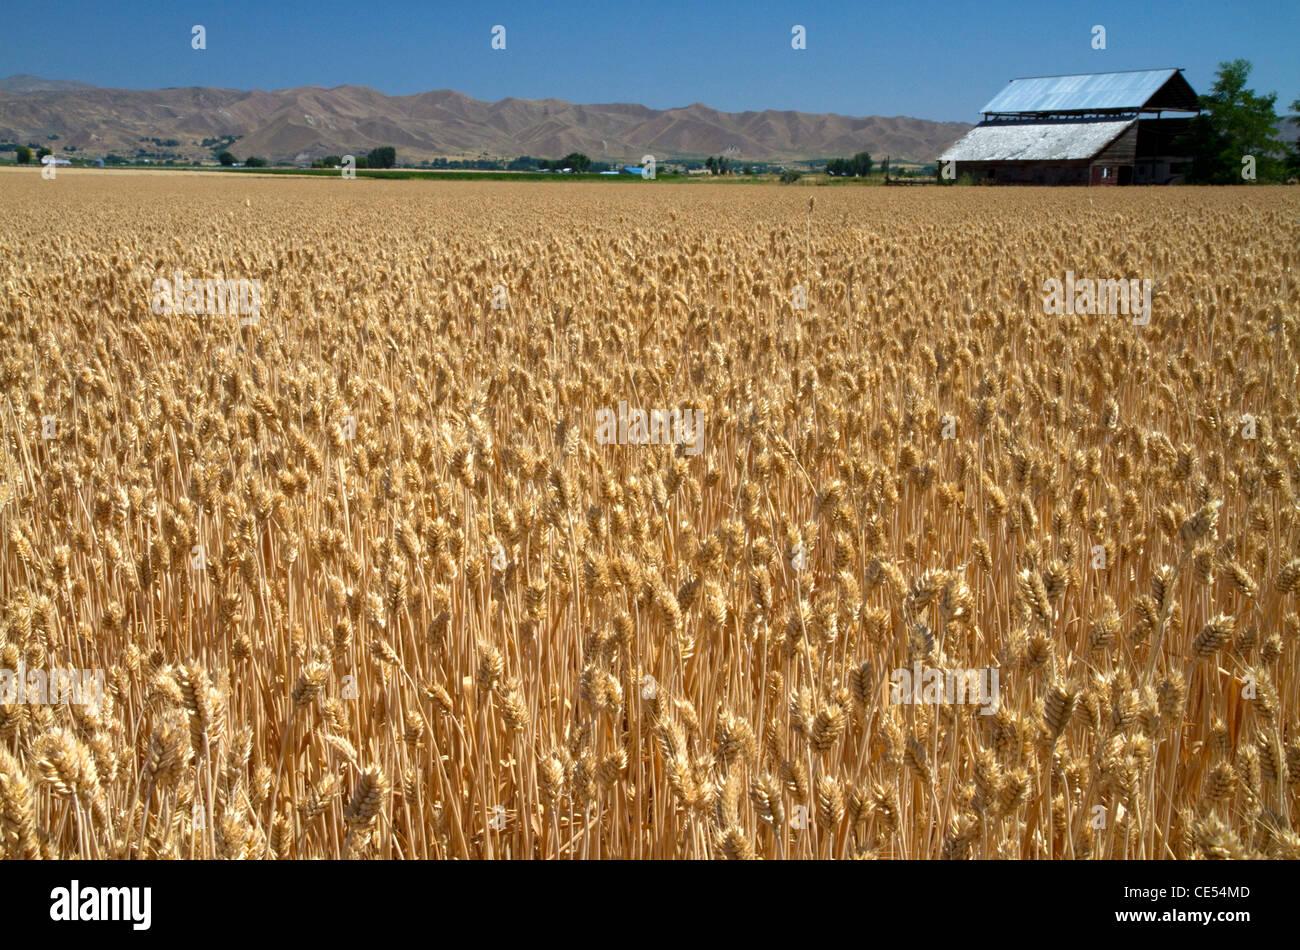 Wheat field near Emmett, Idaho, USA. - Stock Image